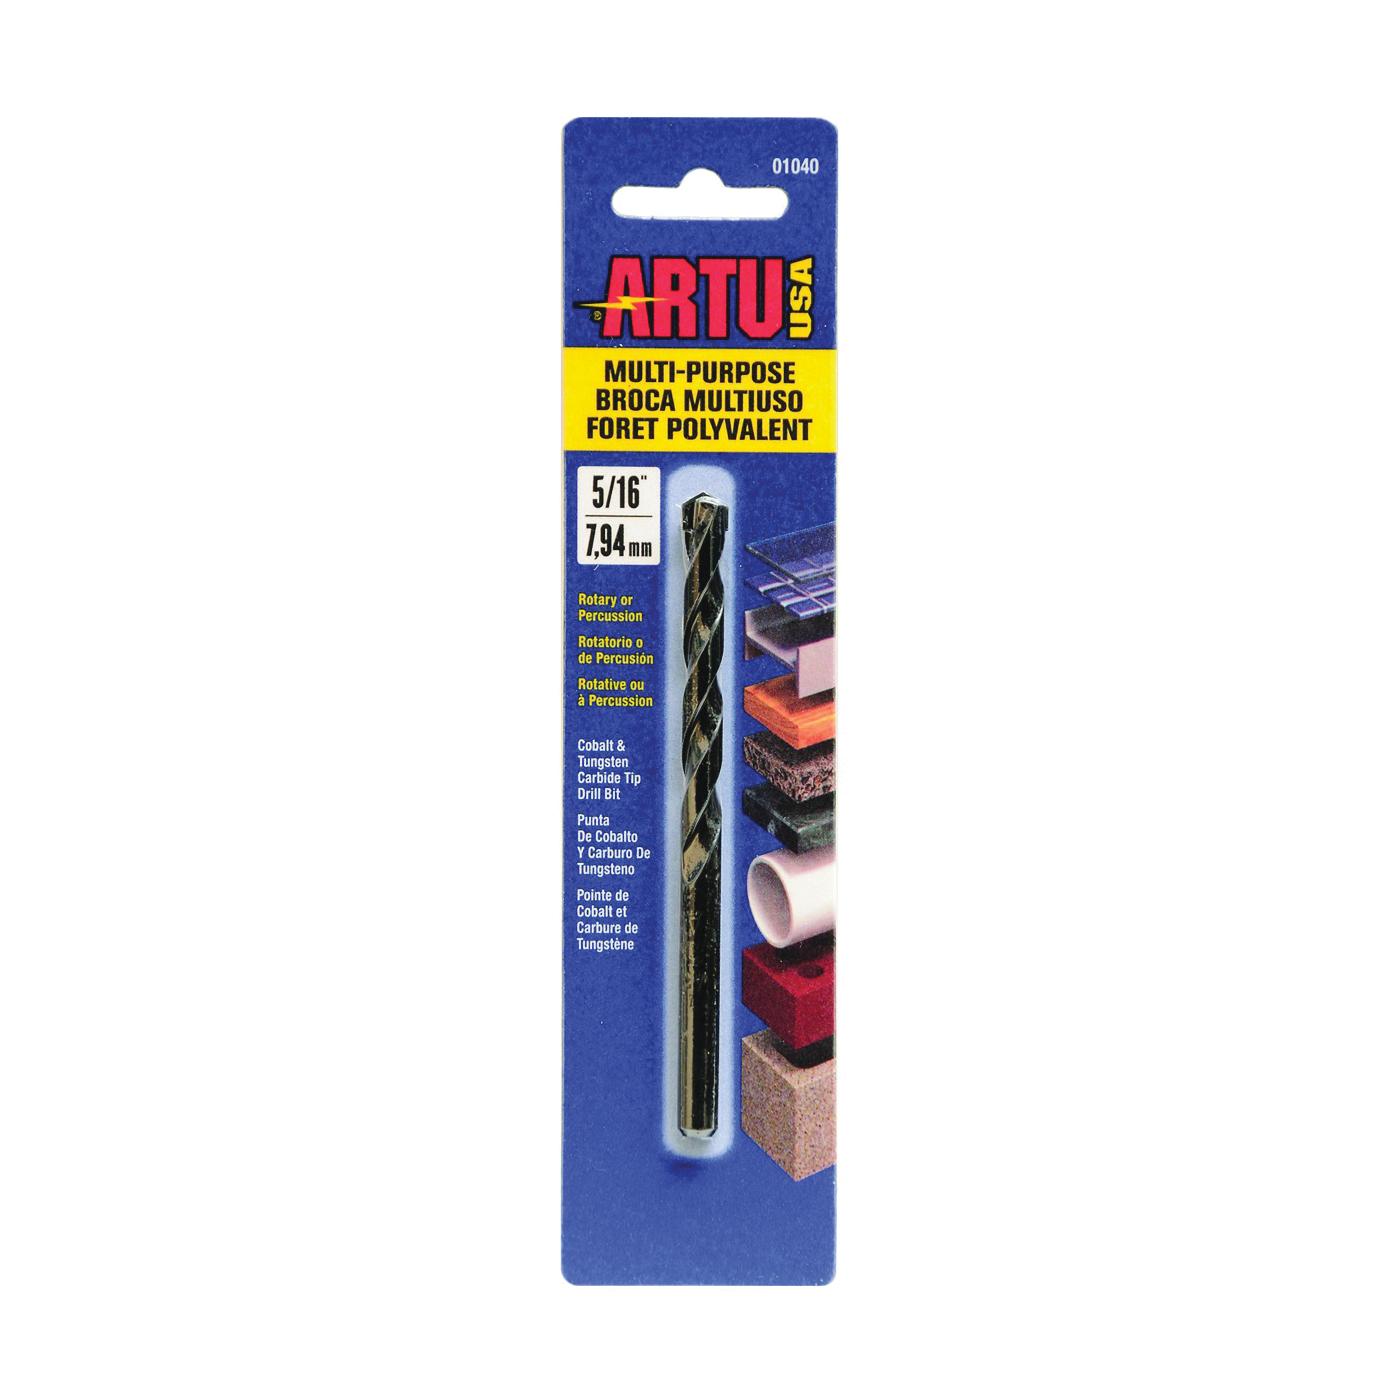 Picture of ARTU 01040 Drill Bit, 5/16 in Dia, 4-1/2 in OAL, Jobber Bit, Parabolic Flute, 5/16 in Dia Shank, Straight Shank